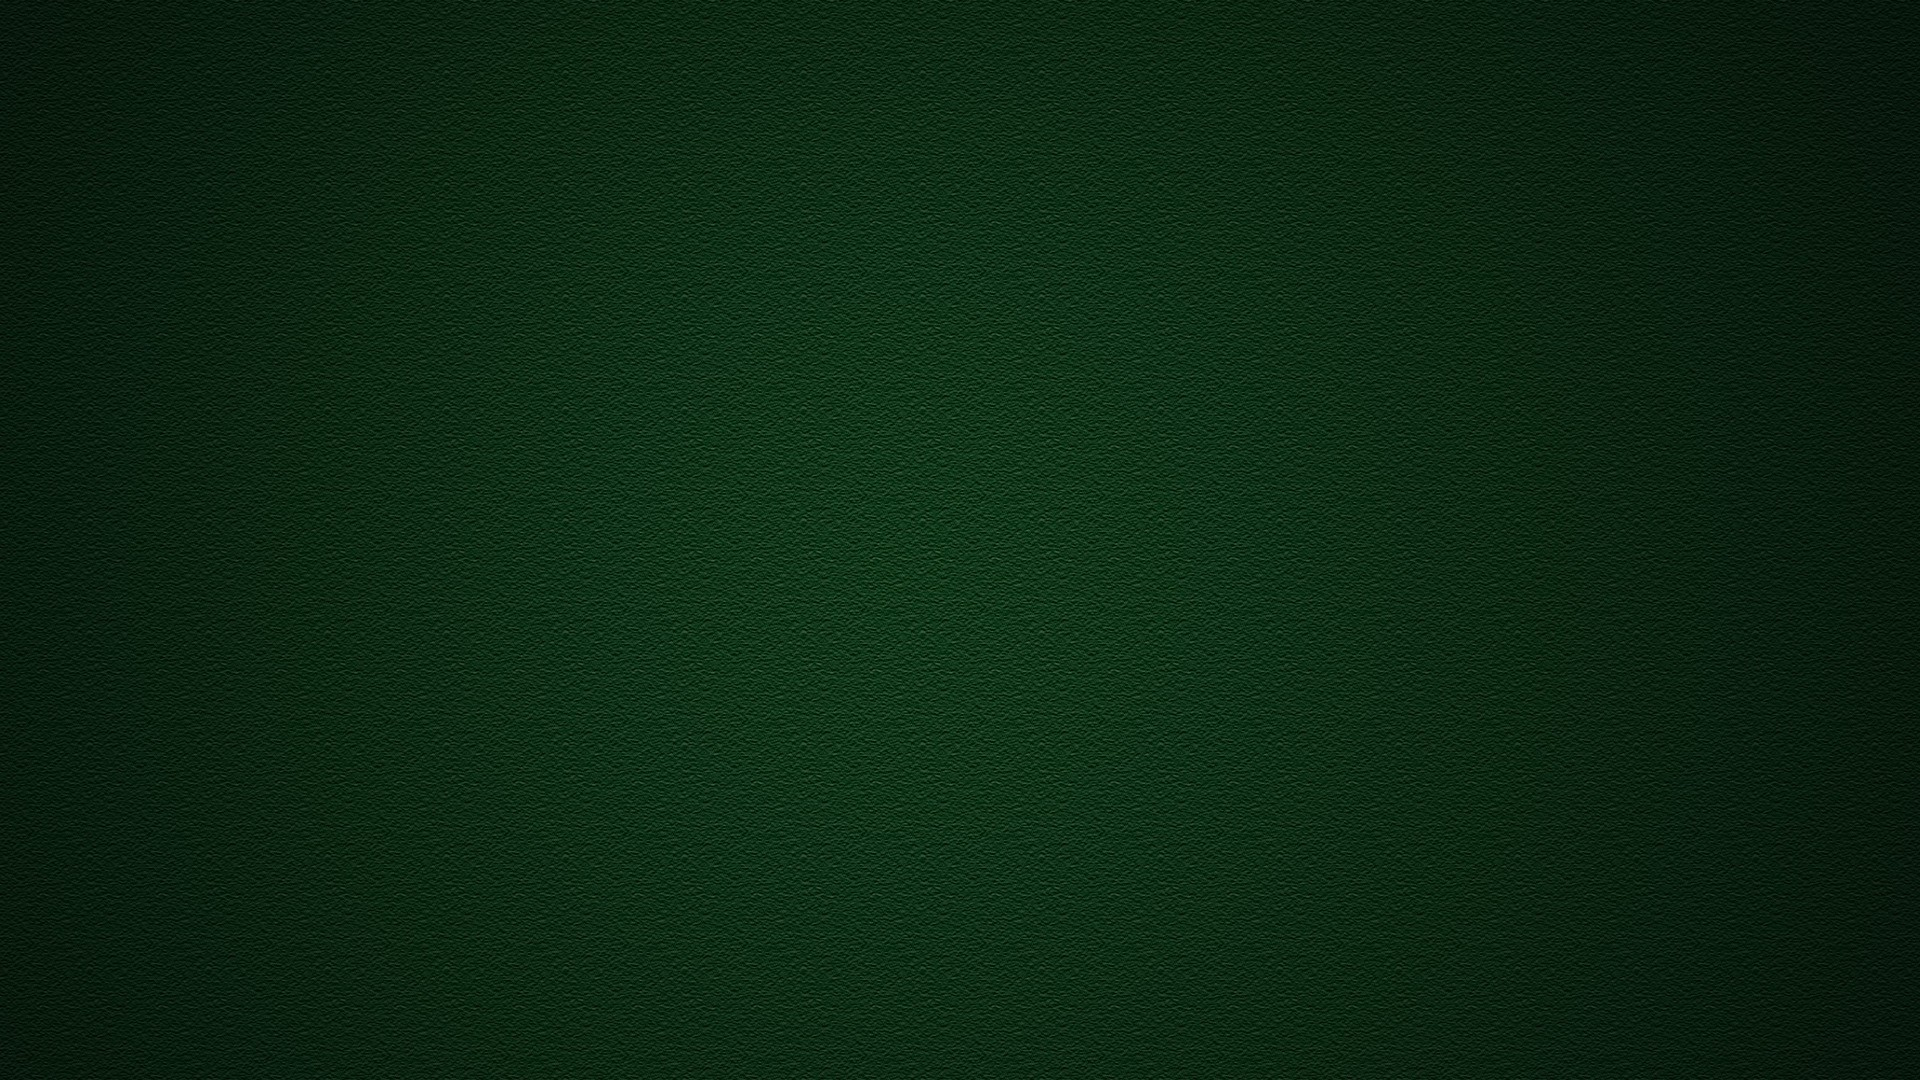 Dark Green Background Wallpaper: Backgrounds-dark-green-textures-2857798-1920×1080